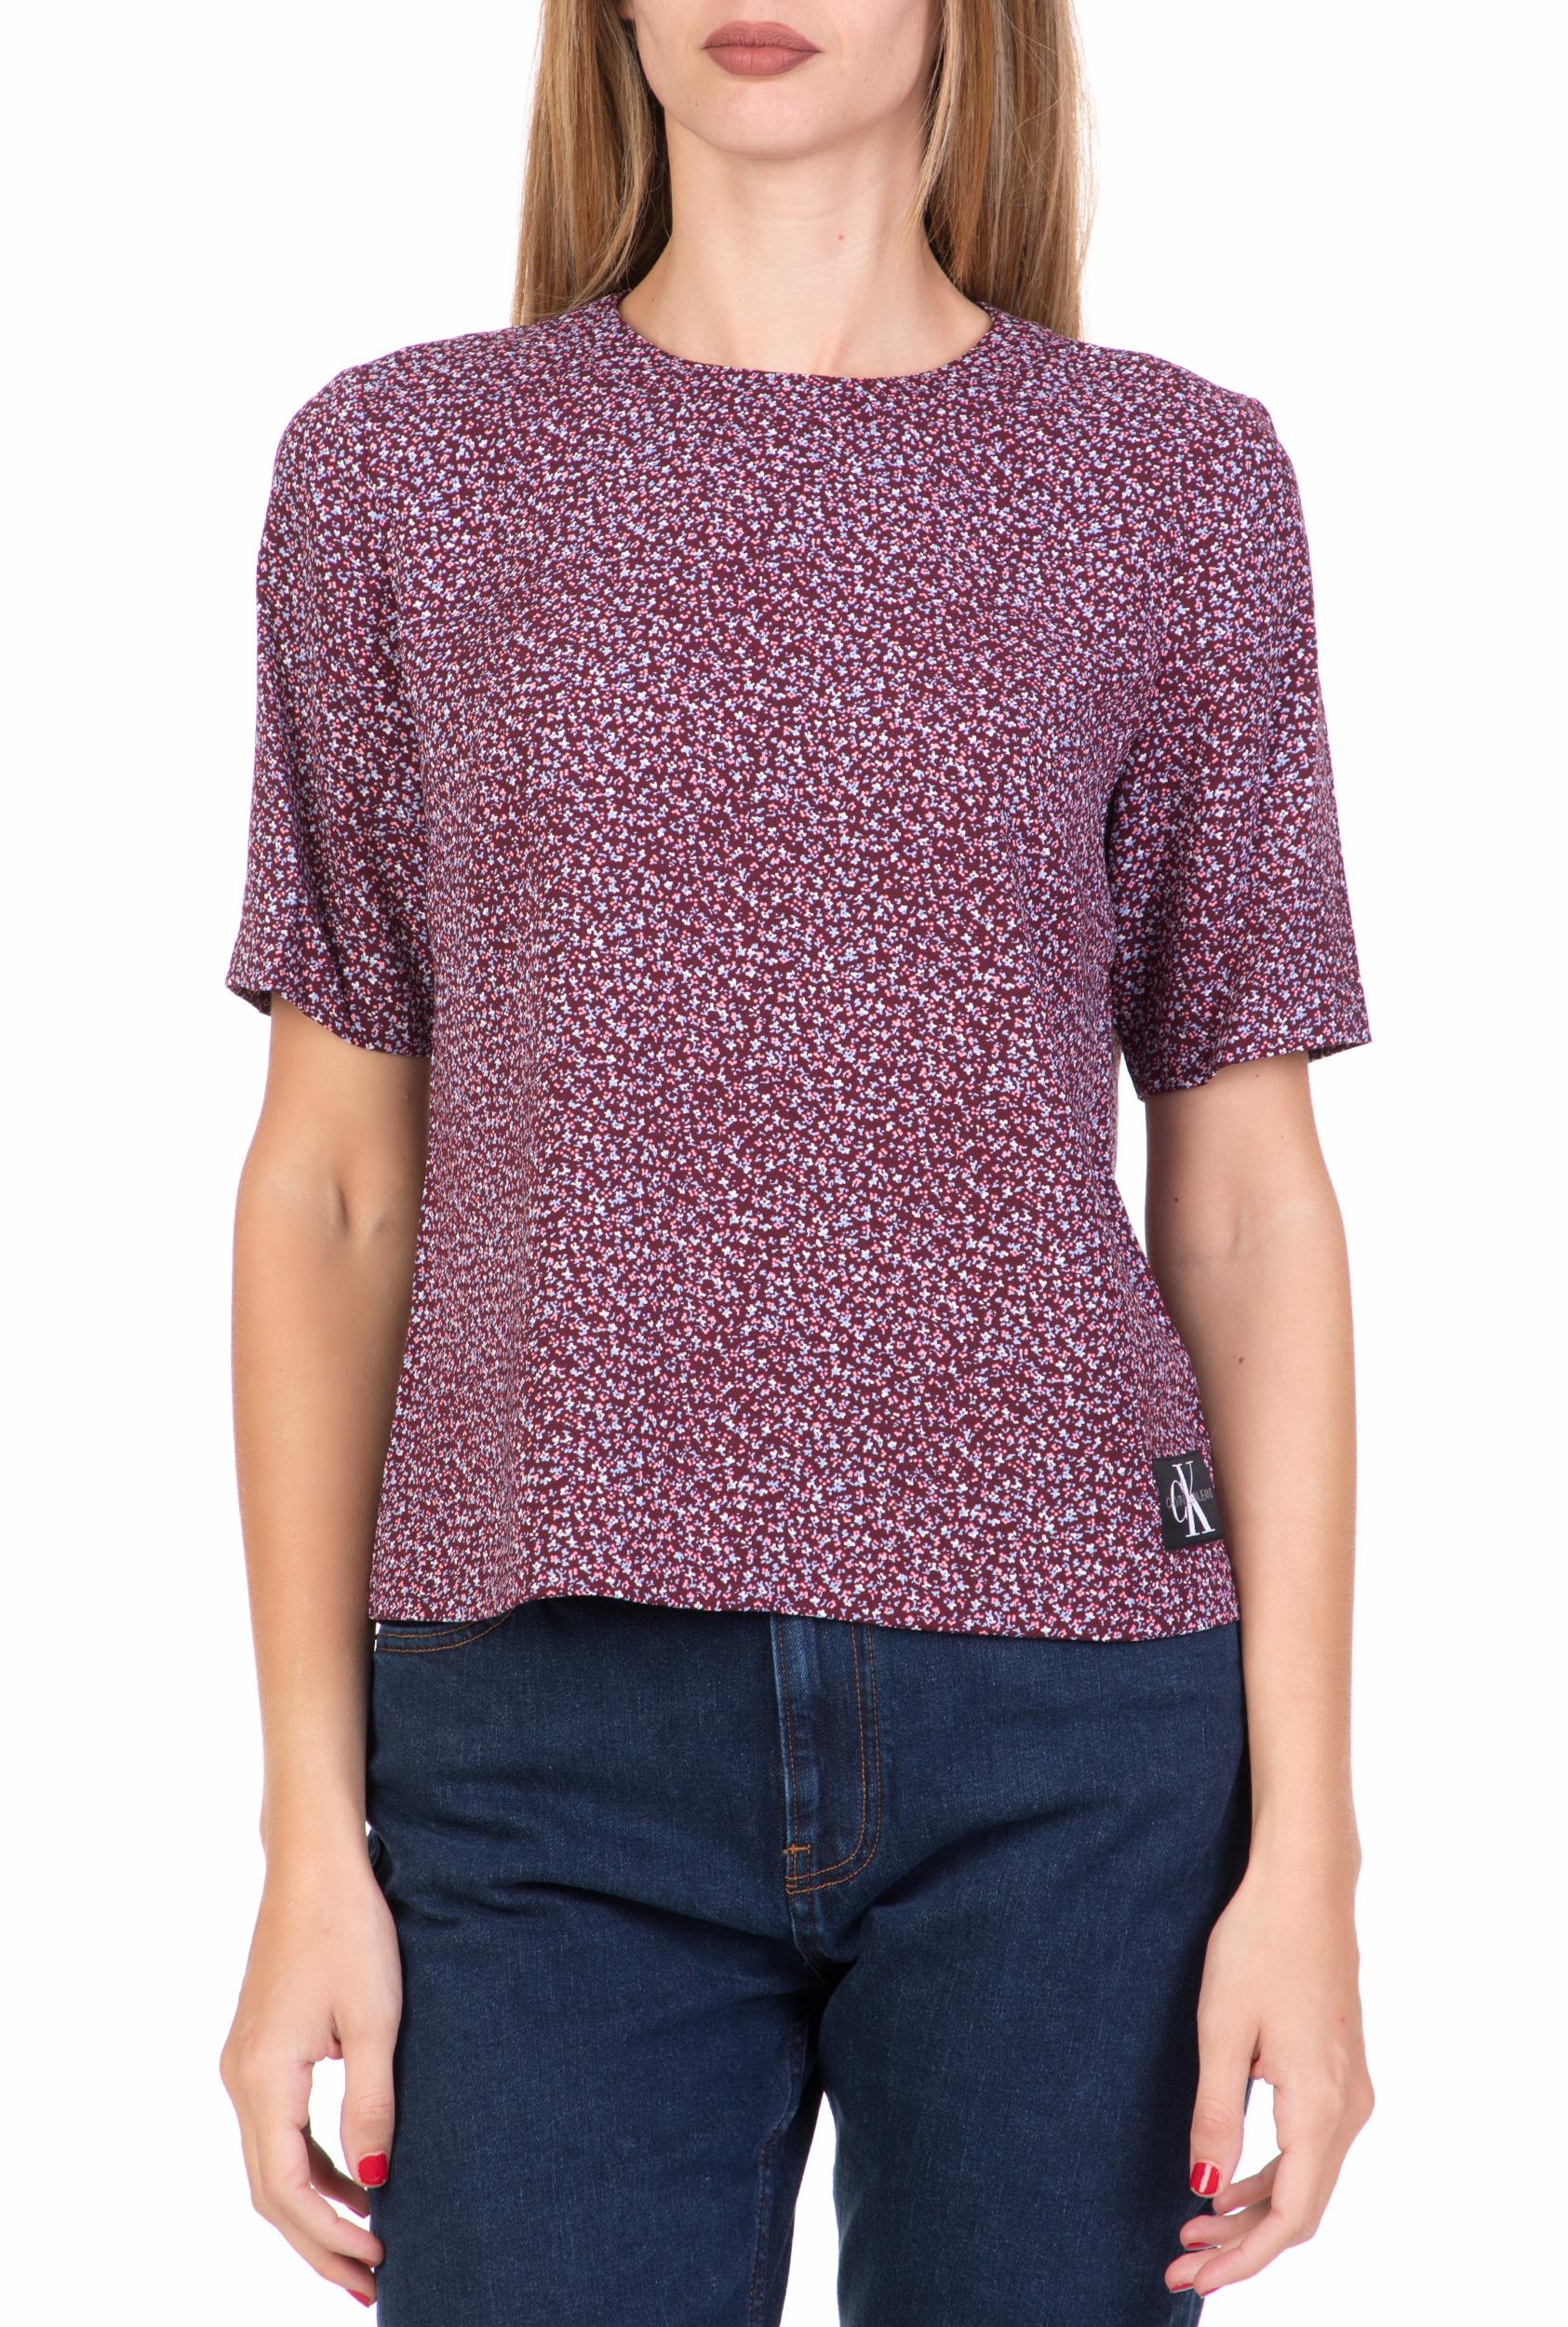 CALVIN KLEIN JEANS - Γυναικεία κοντομάνικη μπλούζα FLOWER PRINT CALVIN KLEIN JEANS μπορντό